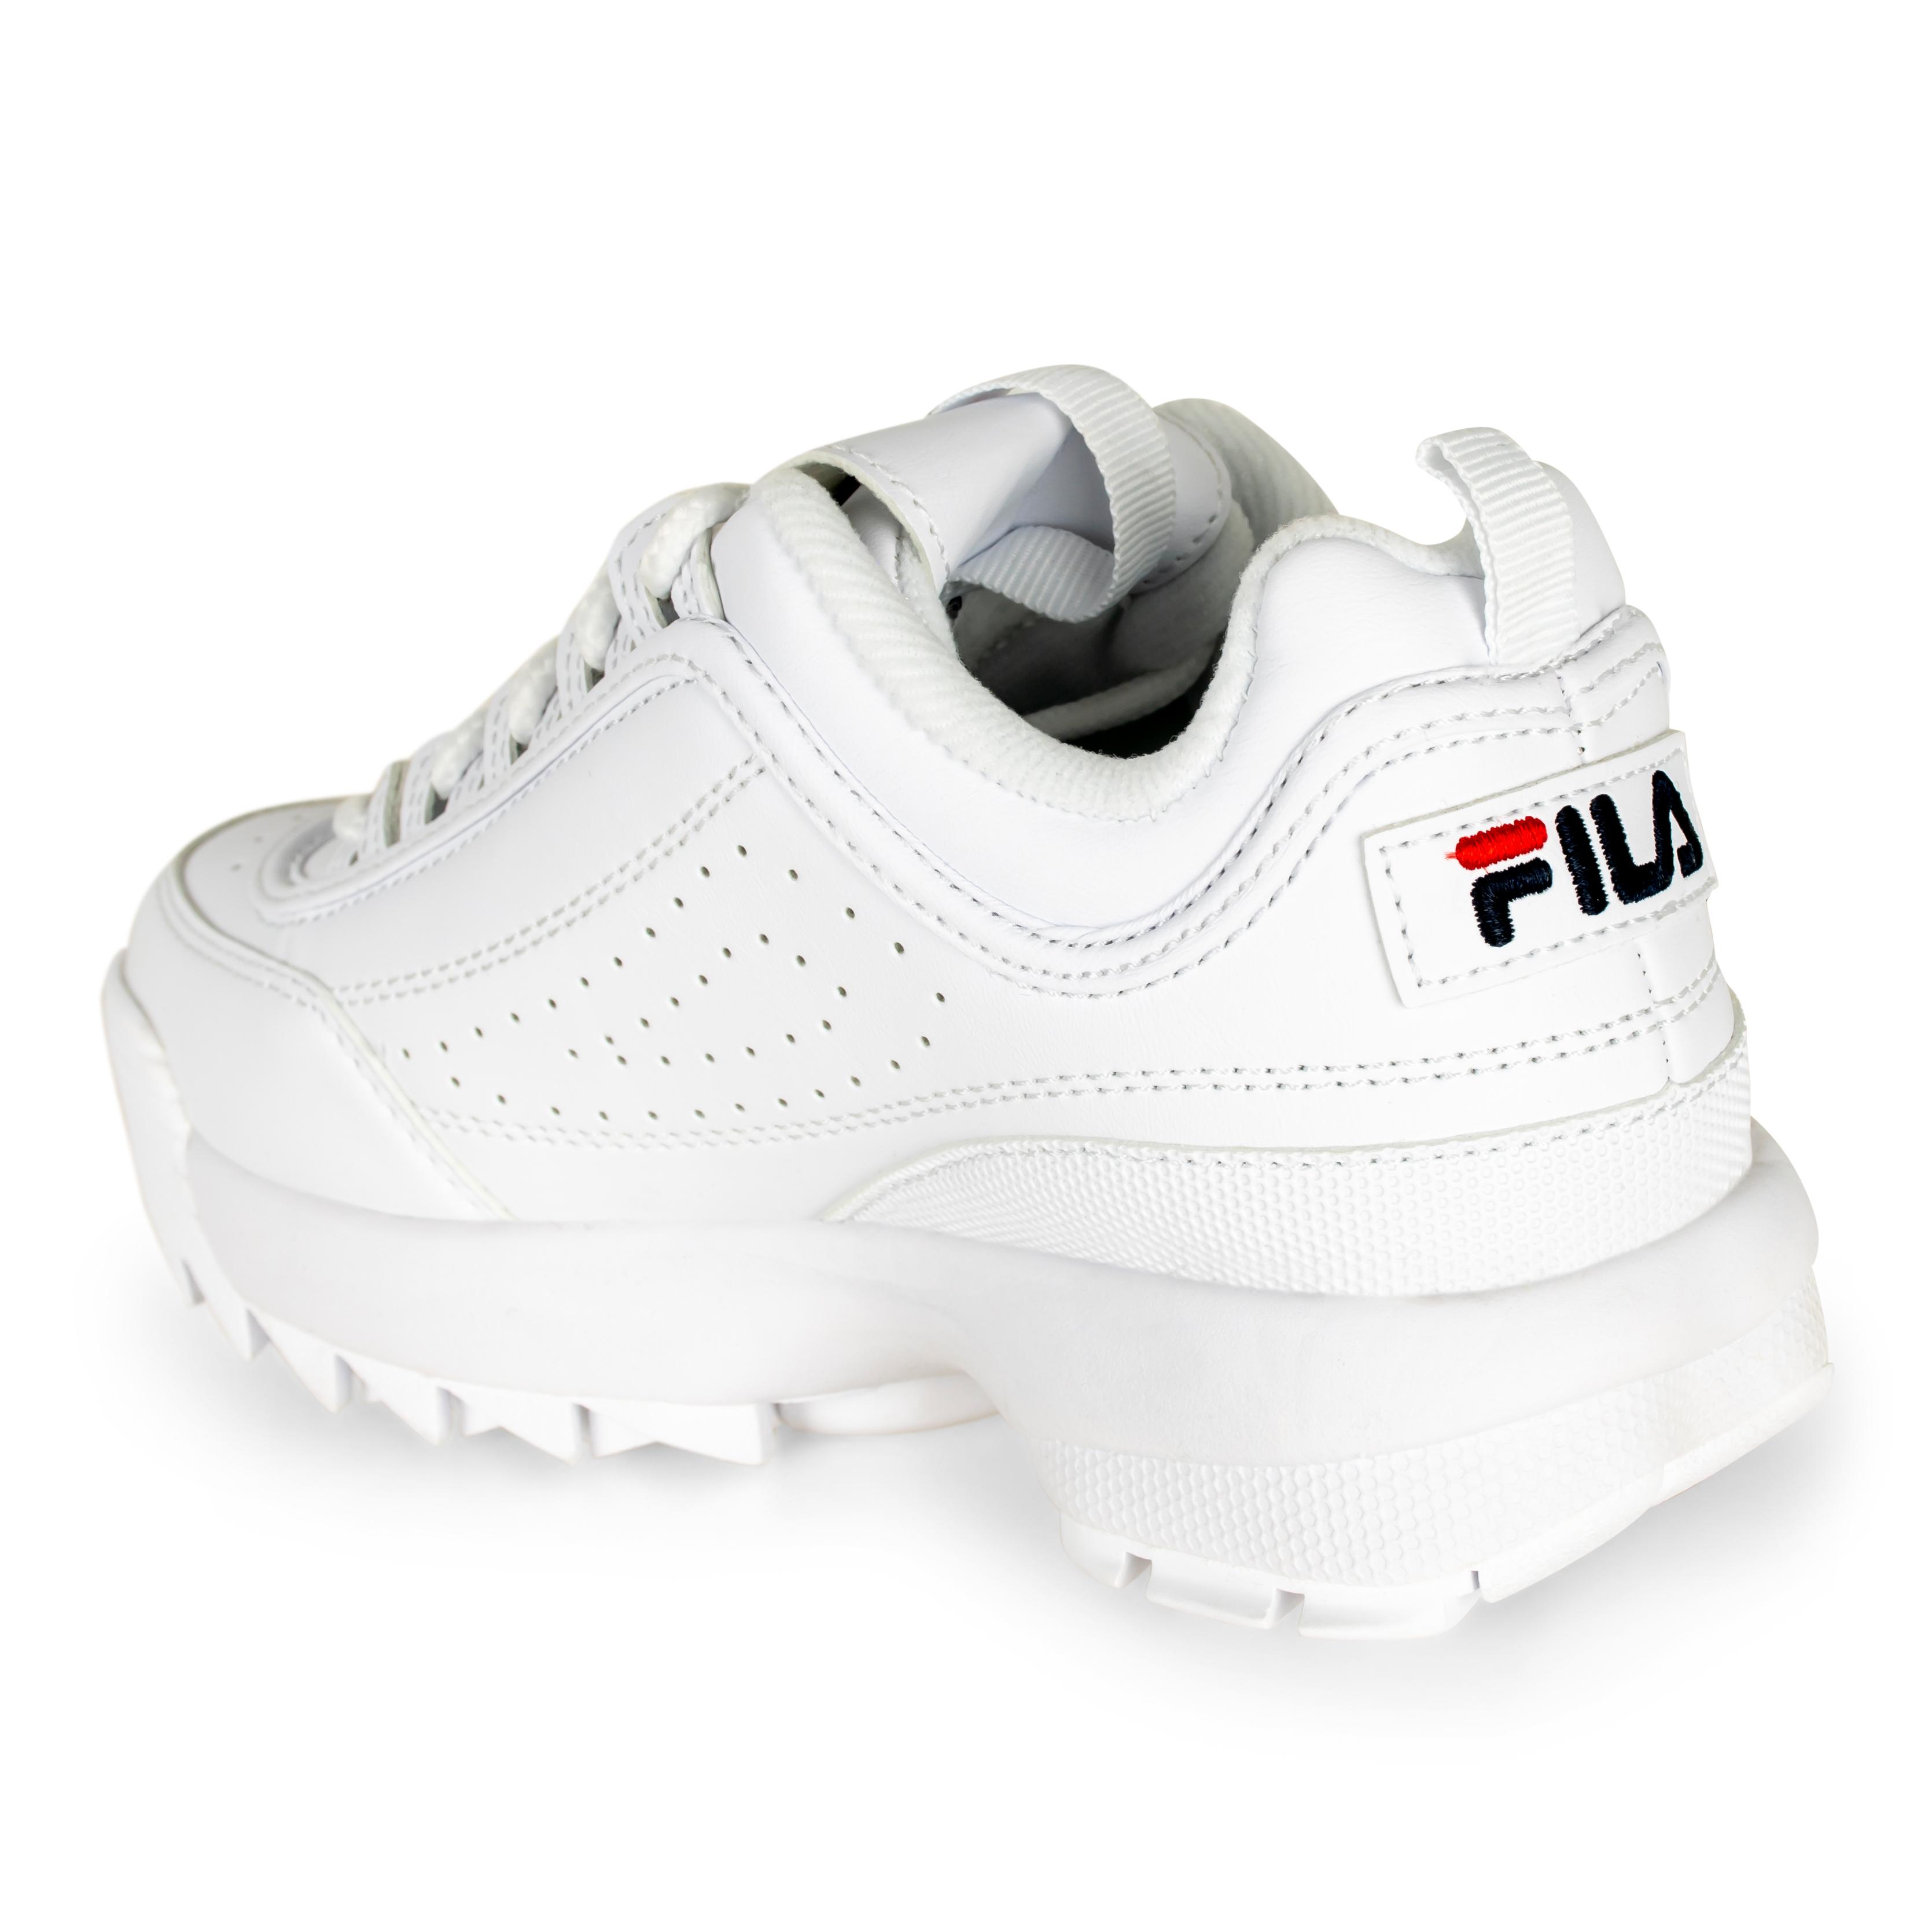 Fila Disruptor Kids sneakers, white, 19